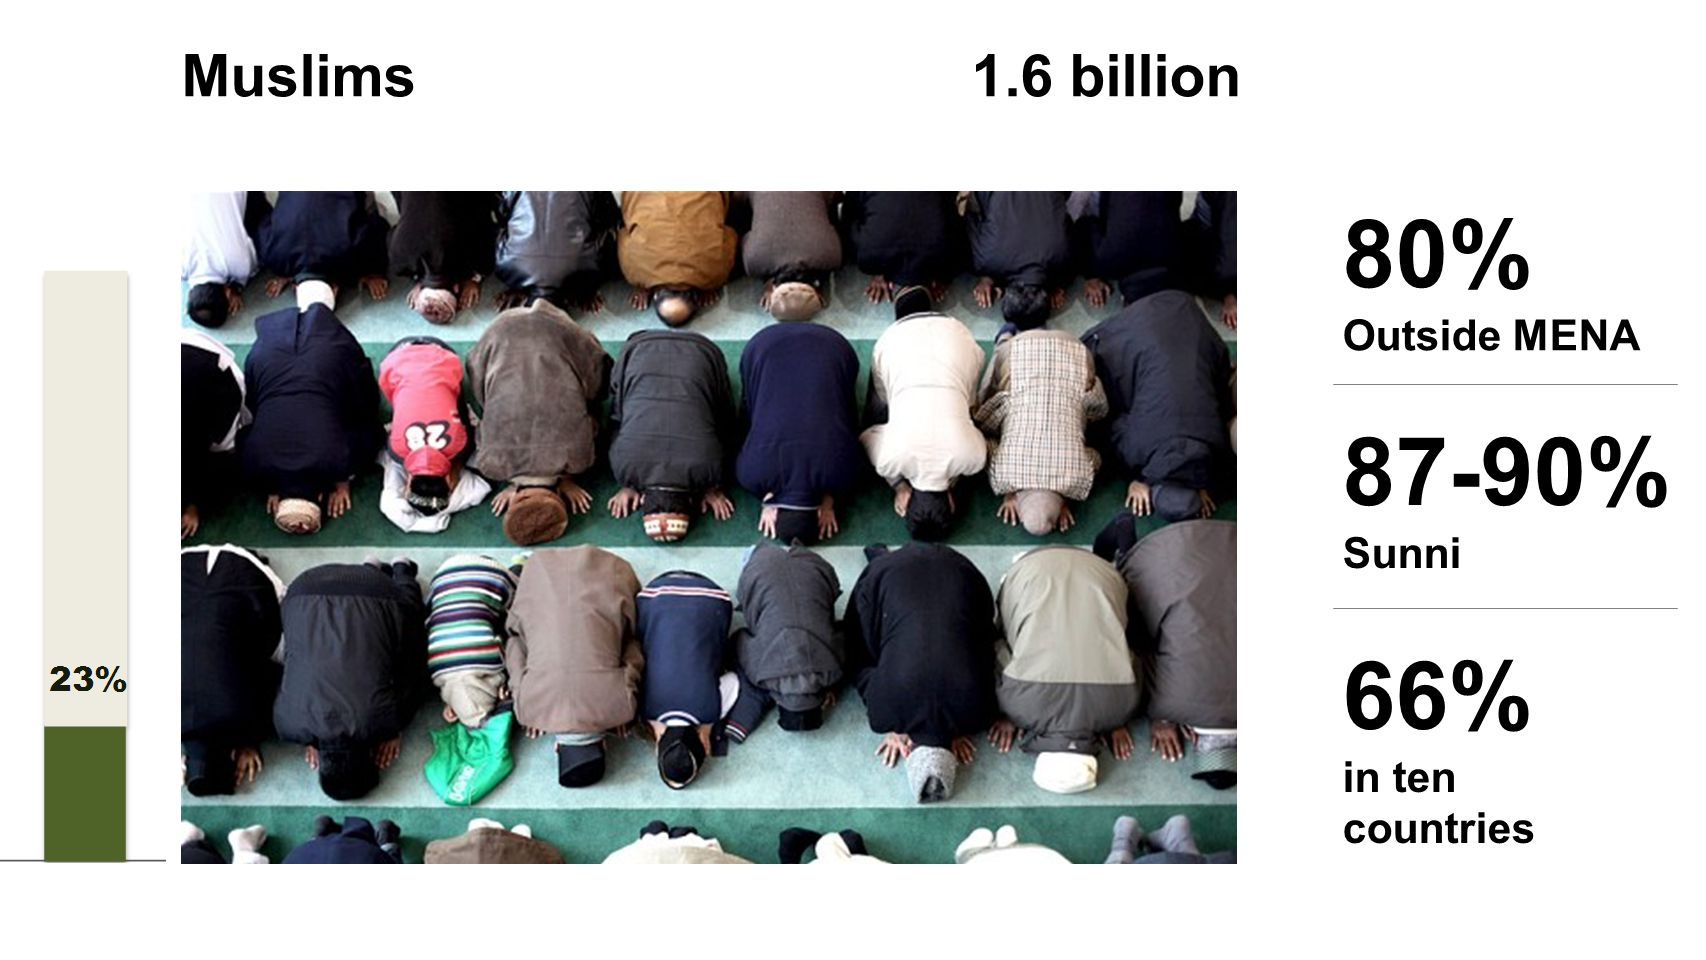 80% Outside MENA 66% in ten countries 87-90% Sunni Muslims 1.6 billion